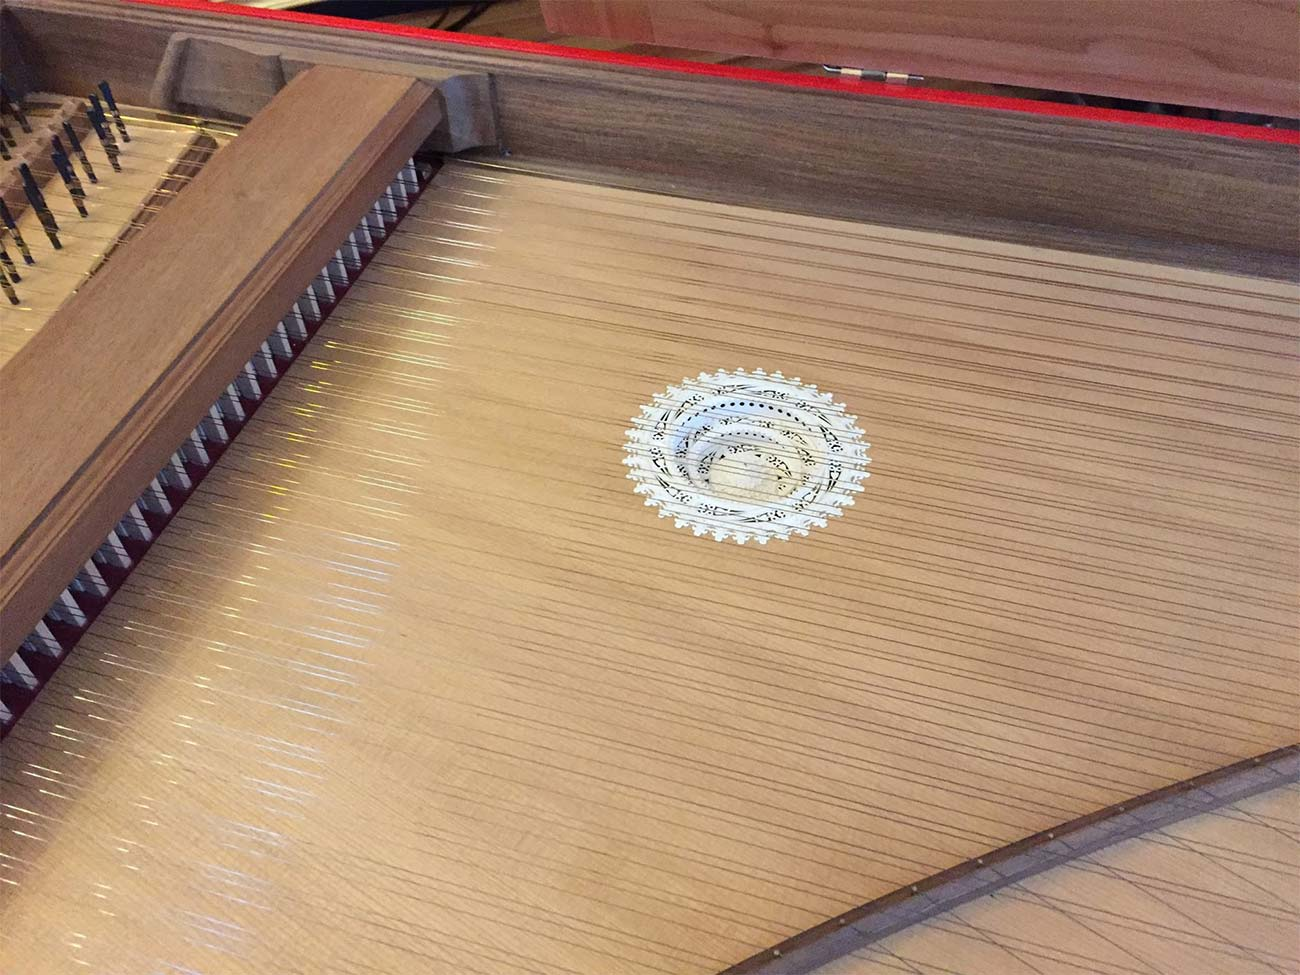 Harpsichord Blanchet detail 1